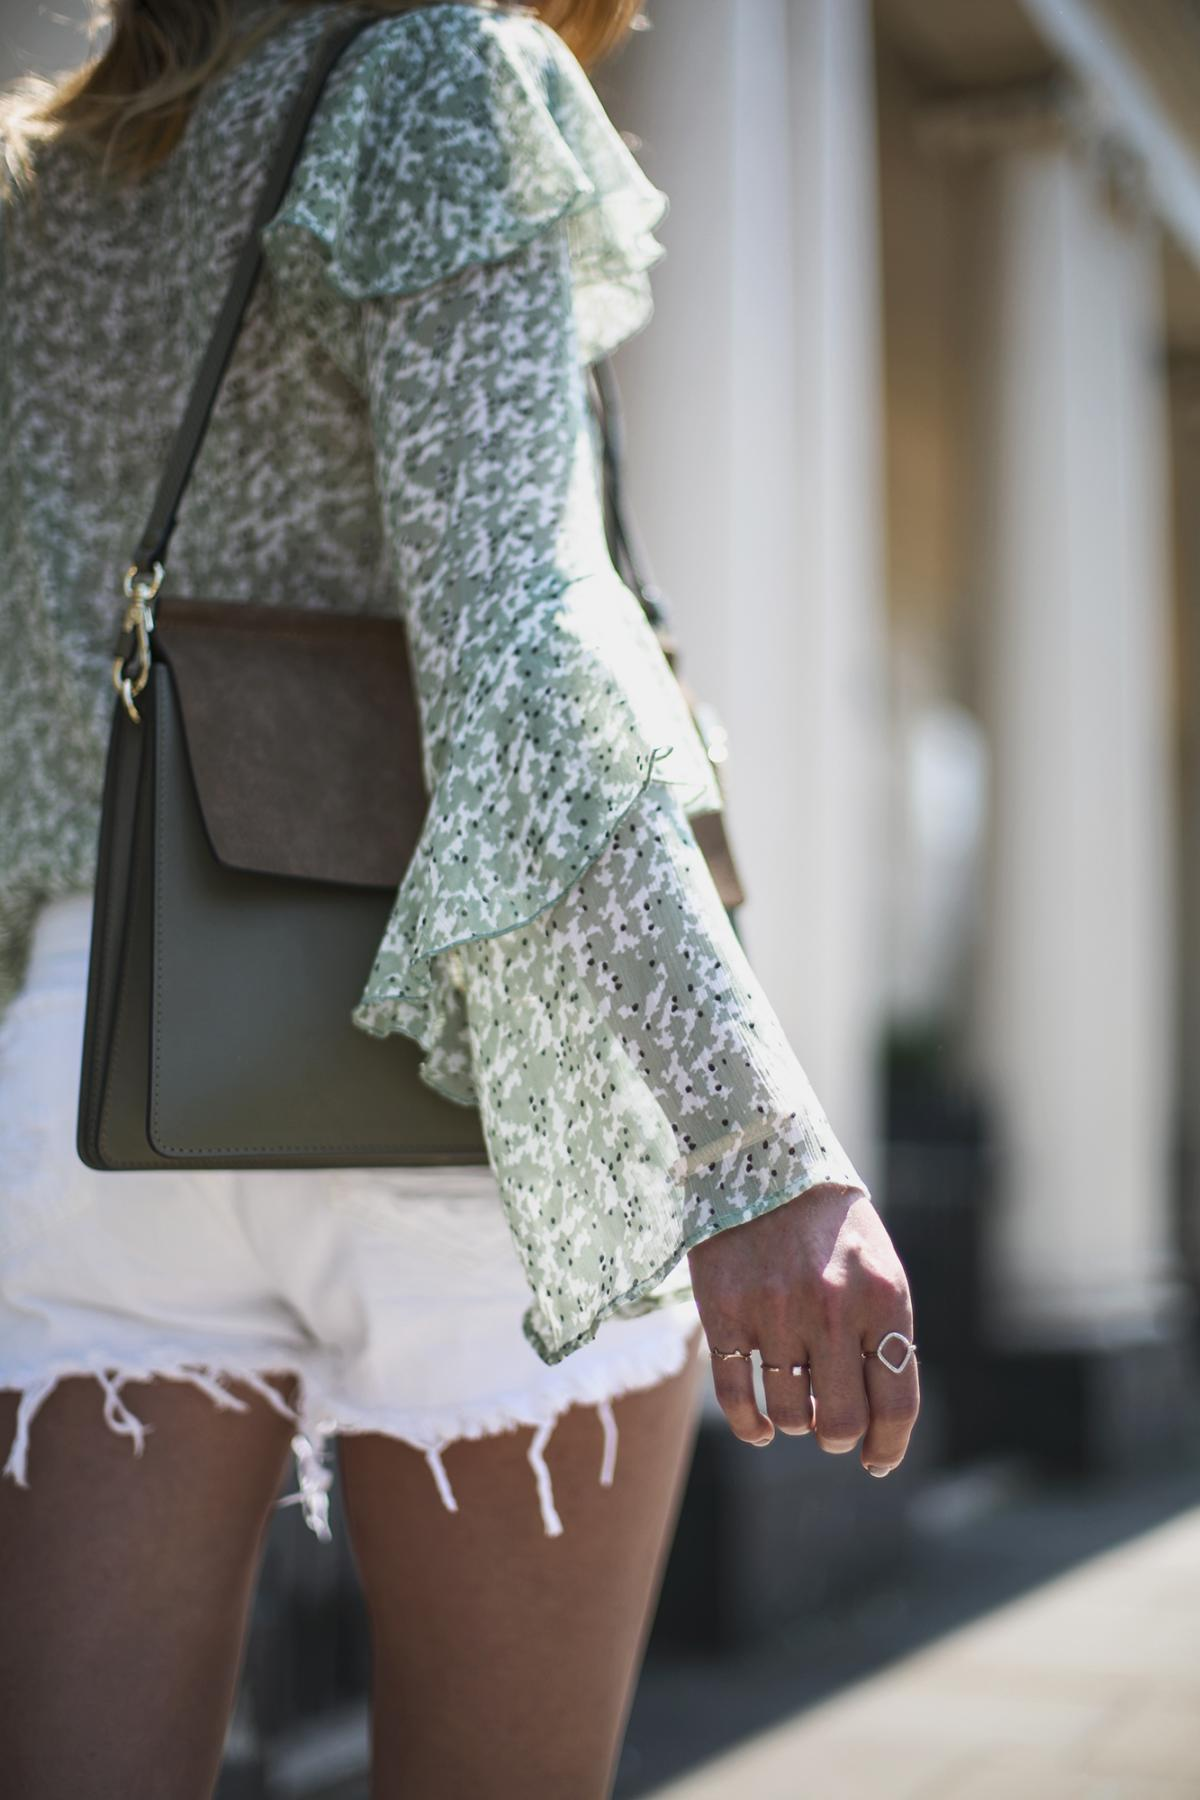 Gren floaty top with flare sleeves, white ripped denim shorts, khaki chloe faye bag, rings